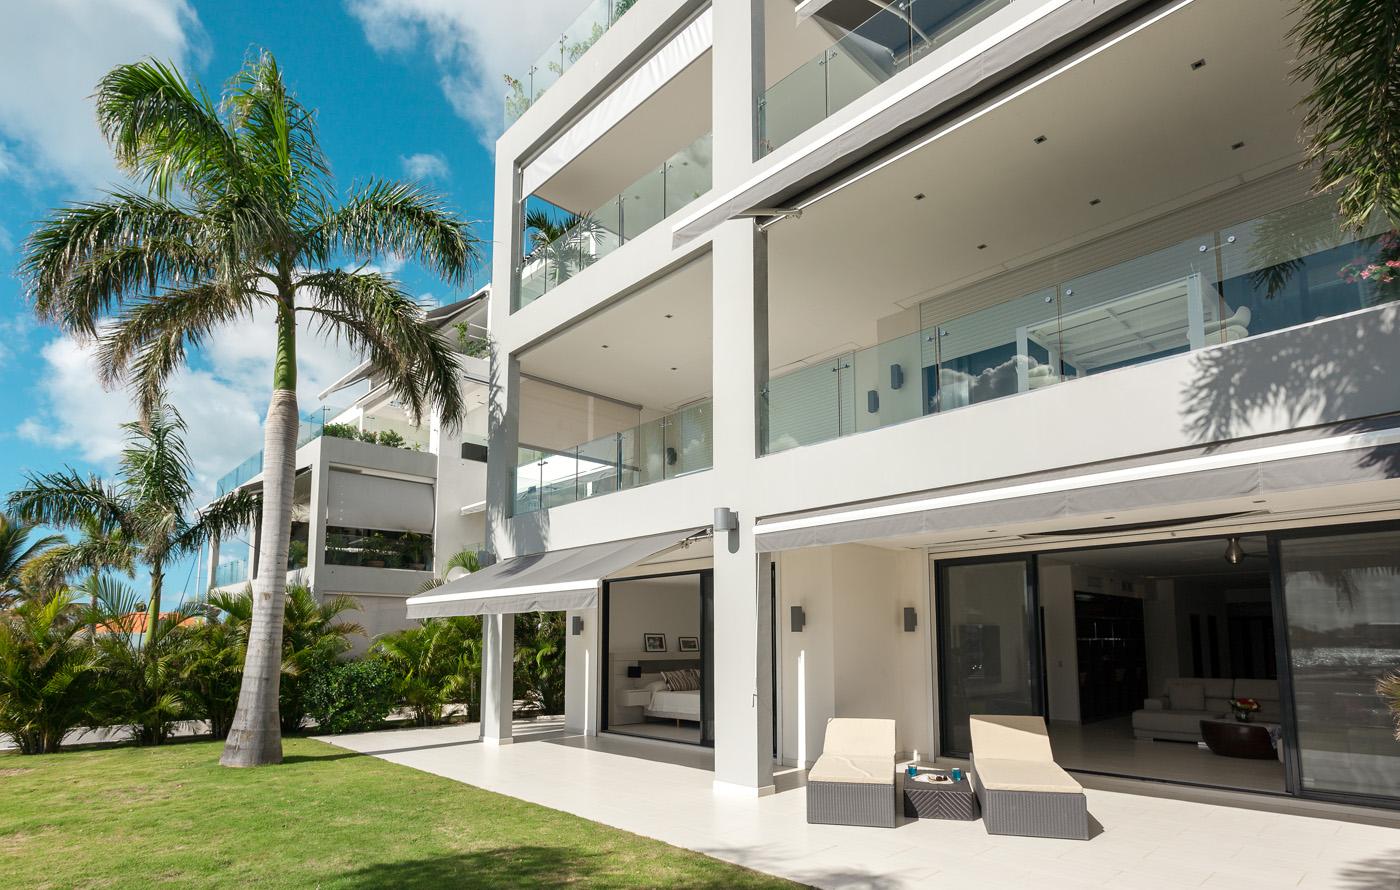 Las Brisas Residence & Marina - 8d60a-_MG_7840.jpg